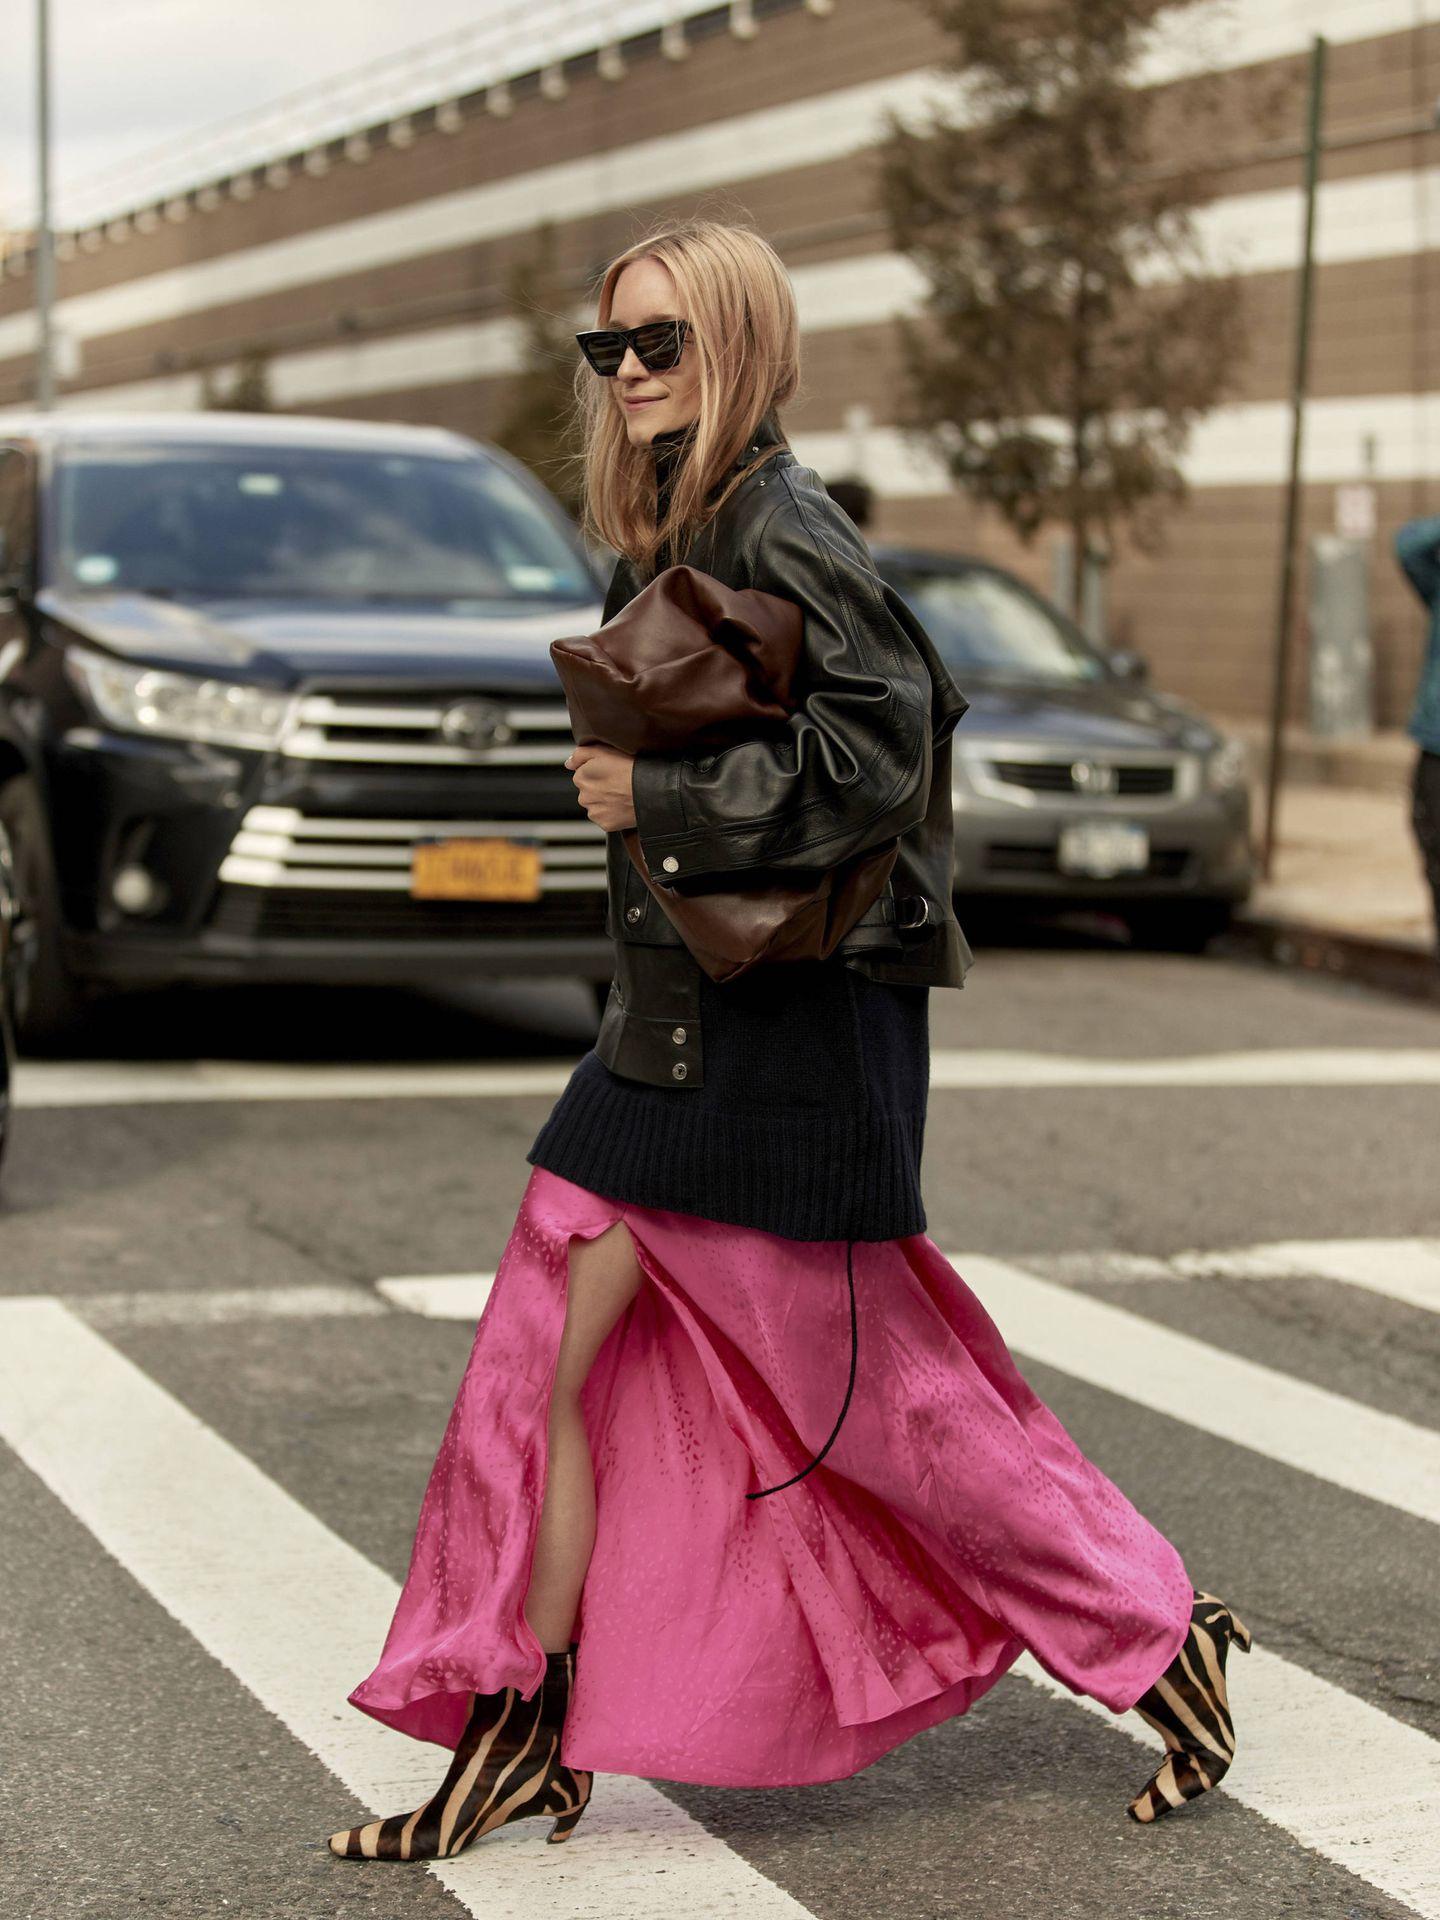 Una prescriptora de moda ataviada con una falda con abertura lateral. (Imaxtree)